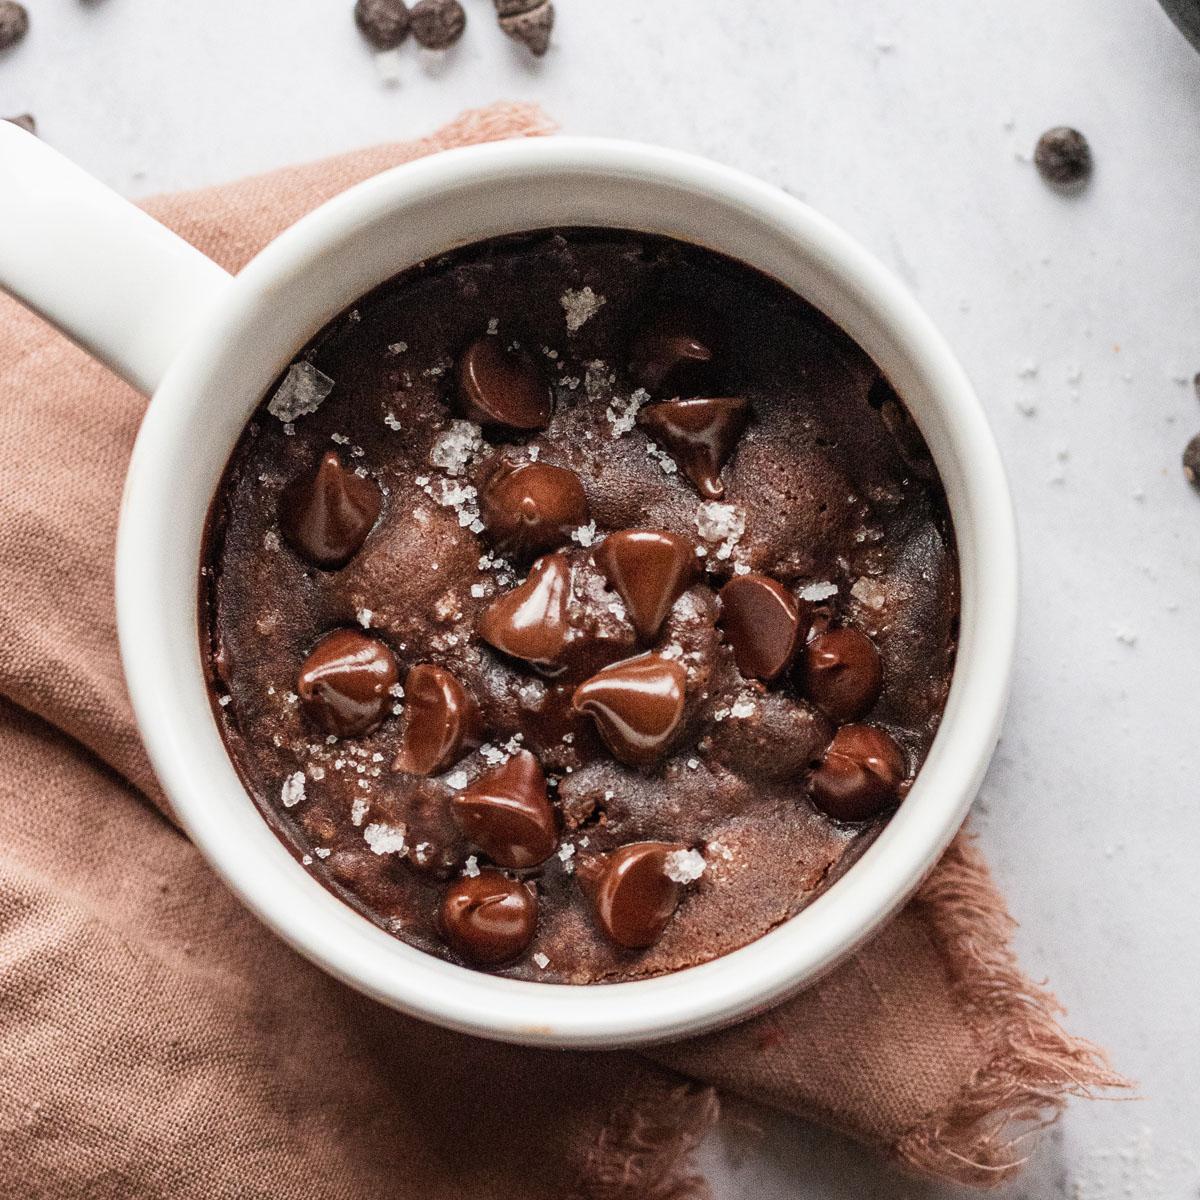 Vegan Mug Brownie 2 Minutes The Live In Kitchen